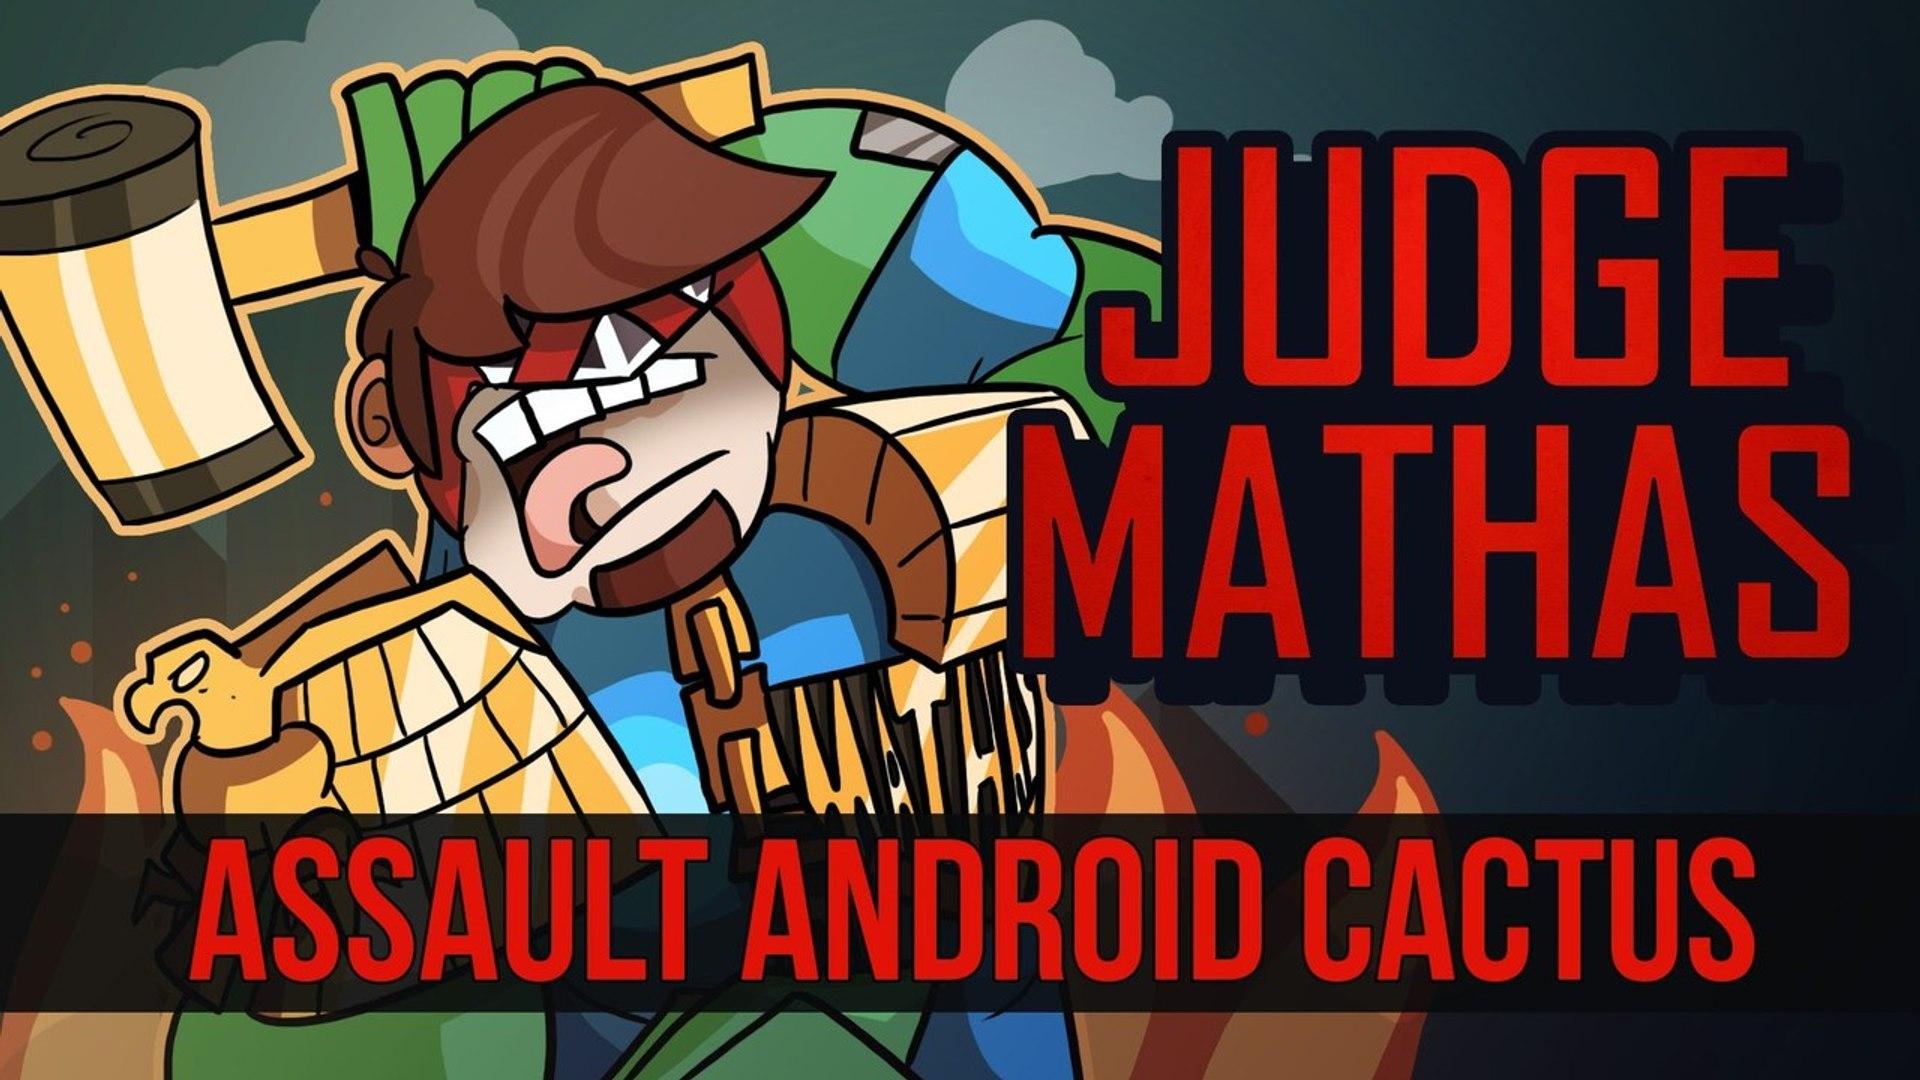 JUDGE MATHAS   ASSAULT ANDROID CACTUS   PC/STEAM